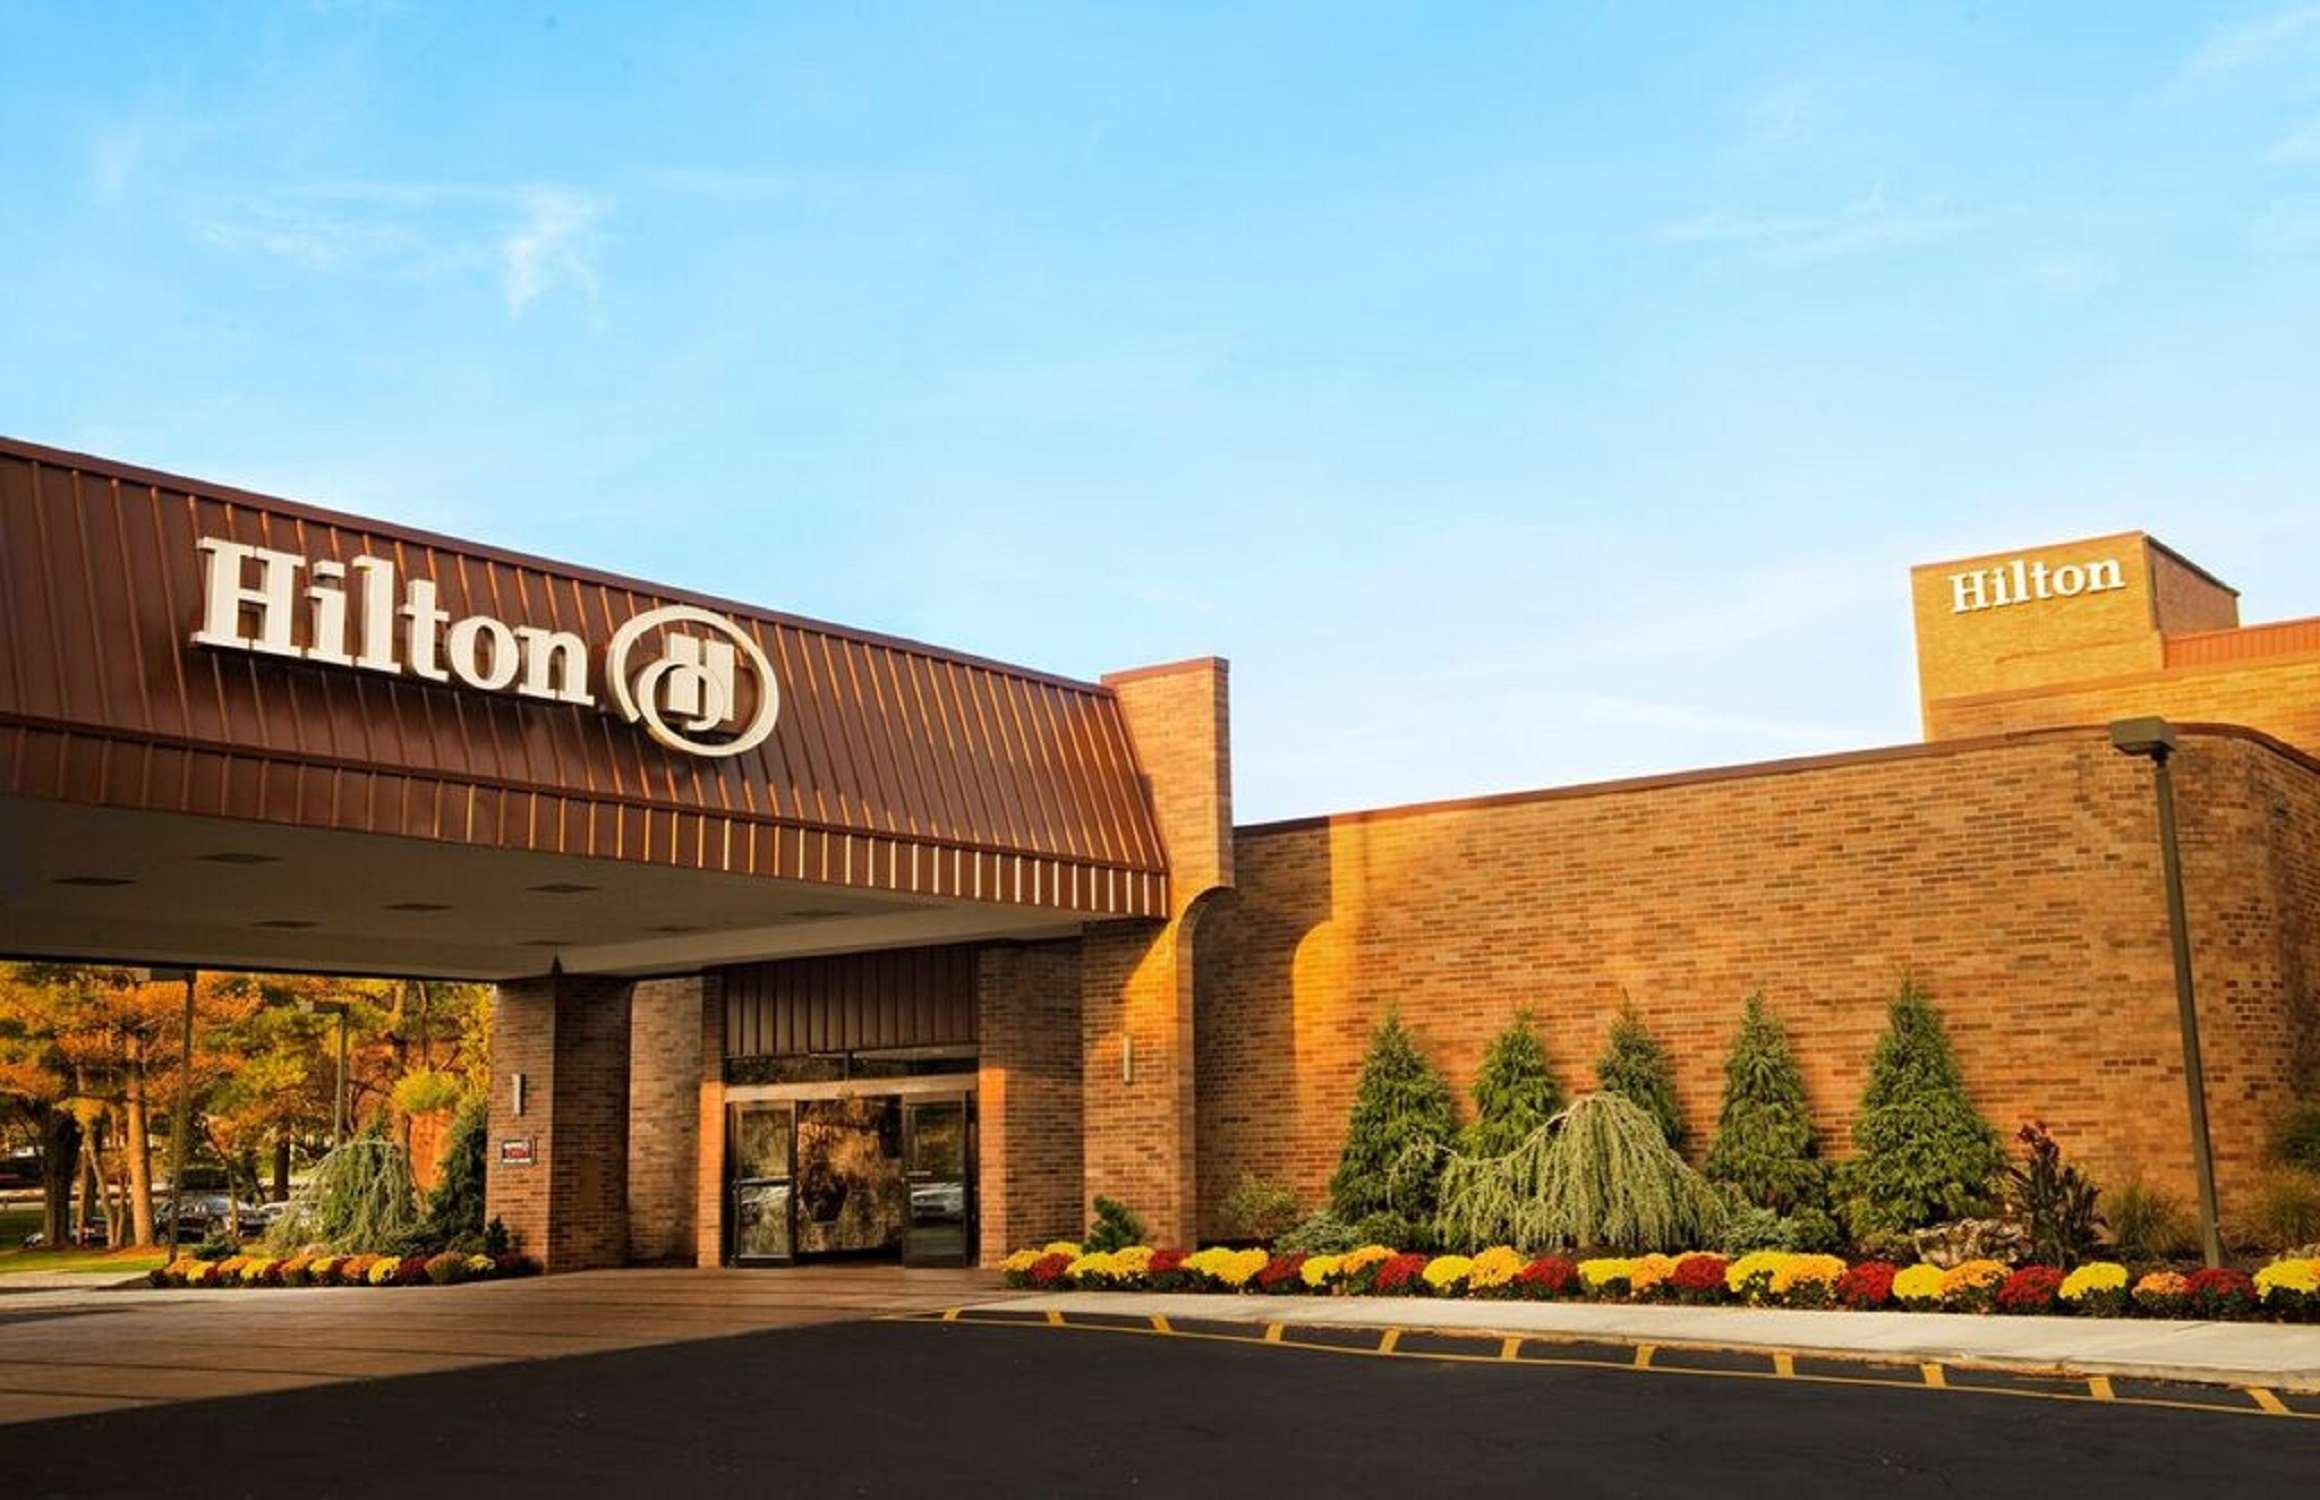 Hilton Parsippany 1 Hilton Ct Parsippany, NJ Hotels & Motels